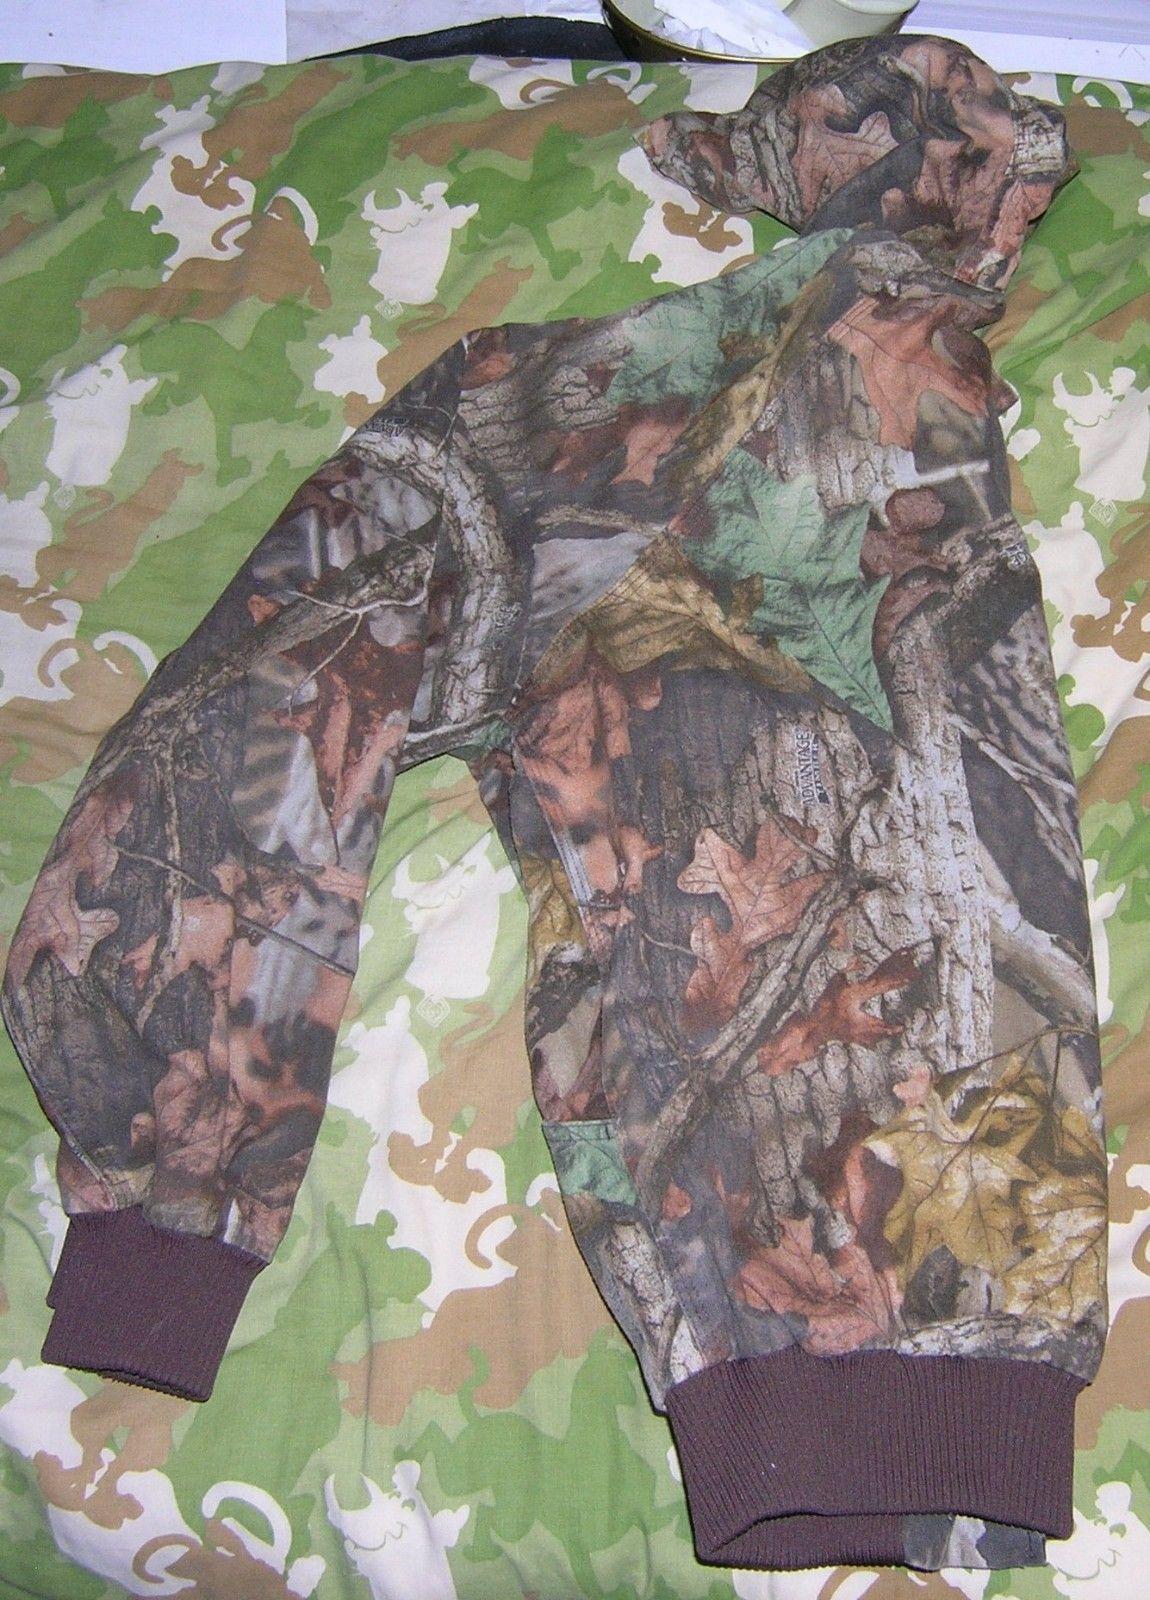 Liberty Rugged Outdoor Gear Hunting Jacket And 50 Similar Items